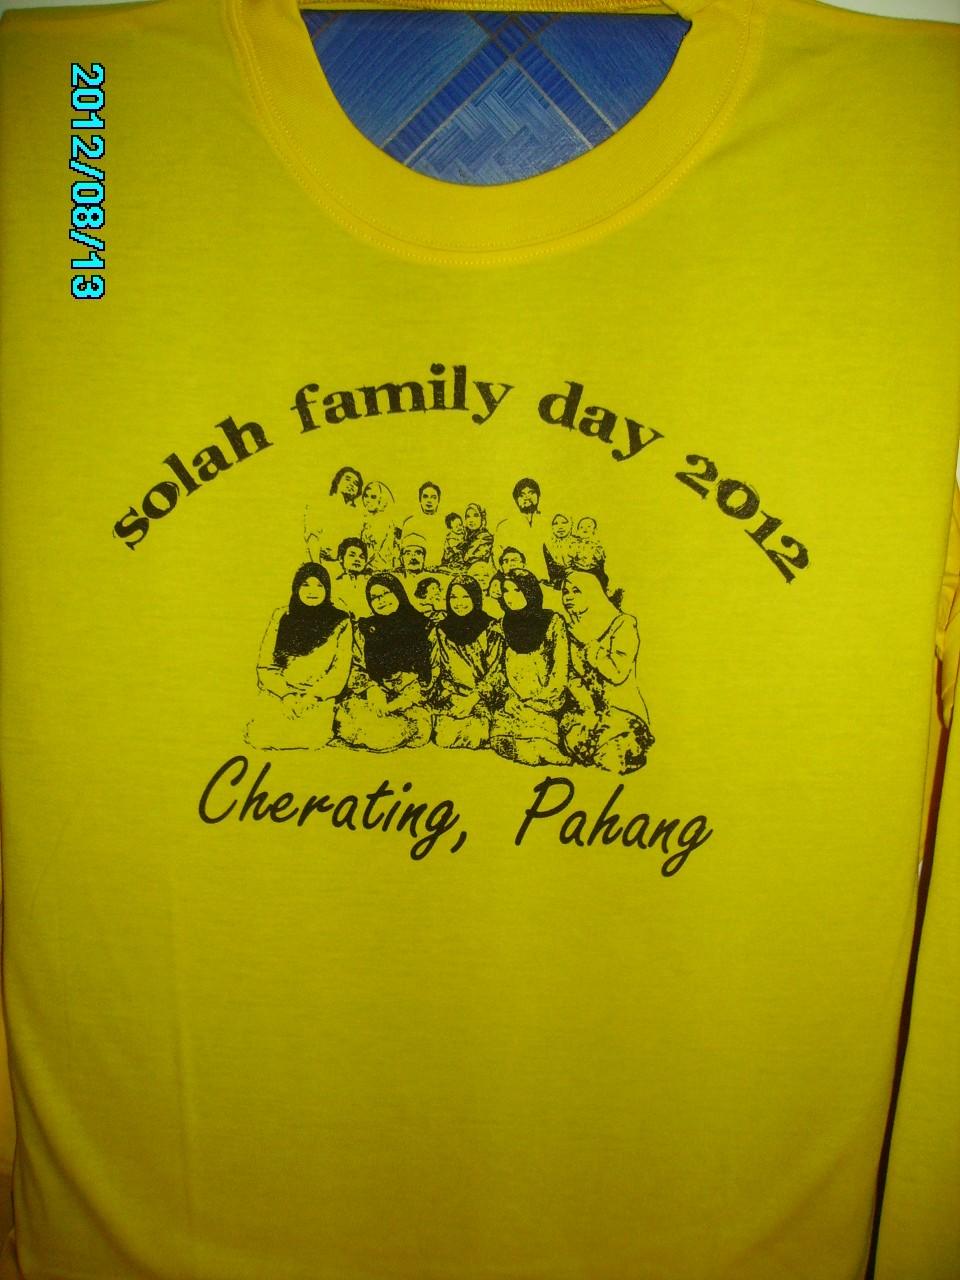 Contoh design t shirt family day - Contoh Desain T Shirt Family Day Contoh Desain T Shirt Family Day Contoh Desain T